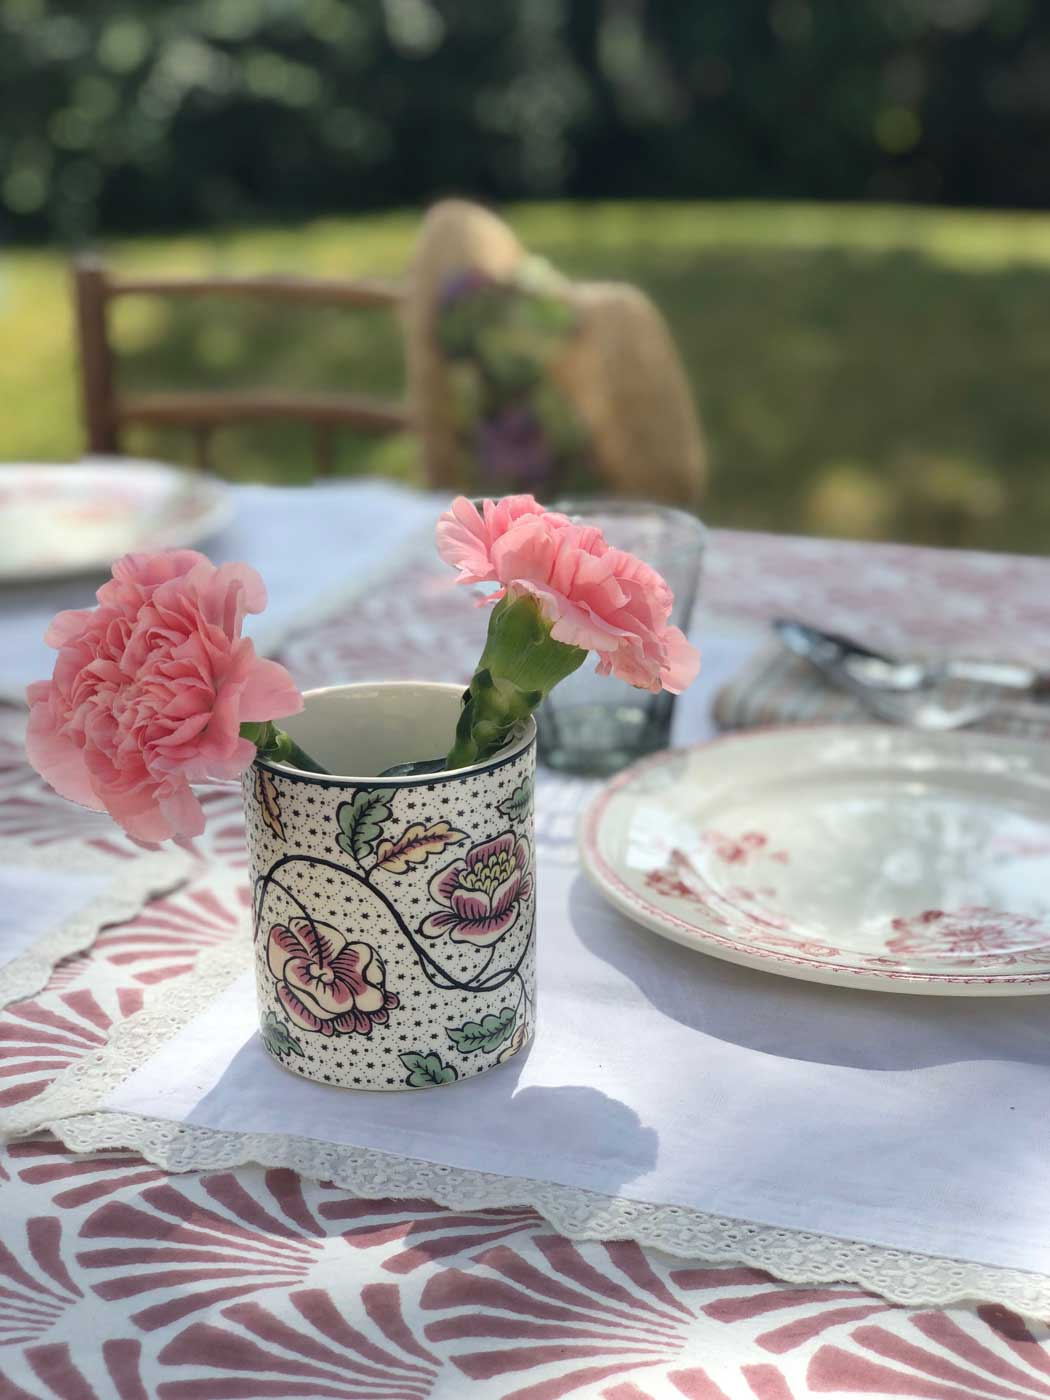 art-de-table-vase-antoinette-poisson-campagne-chic